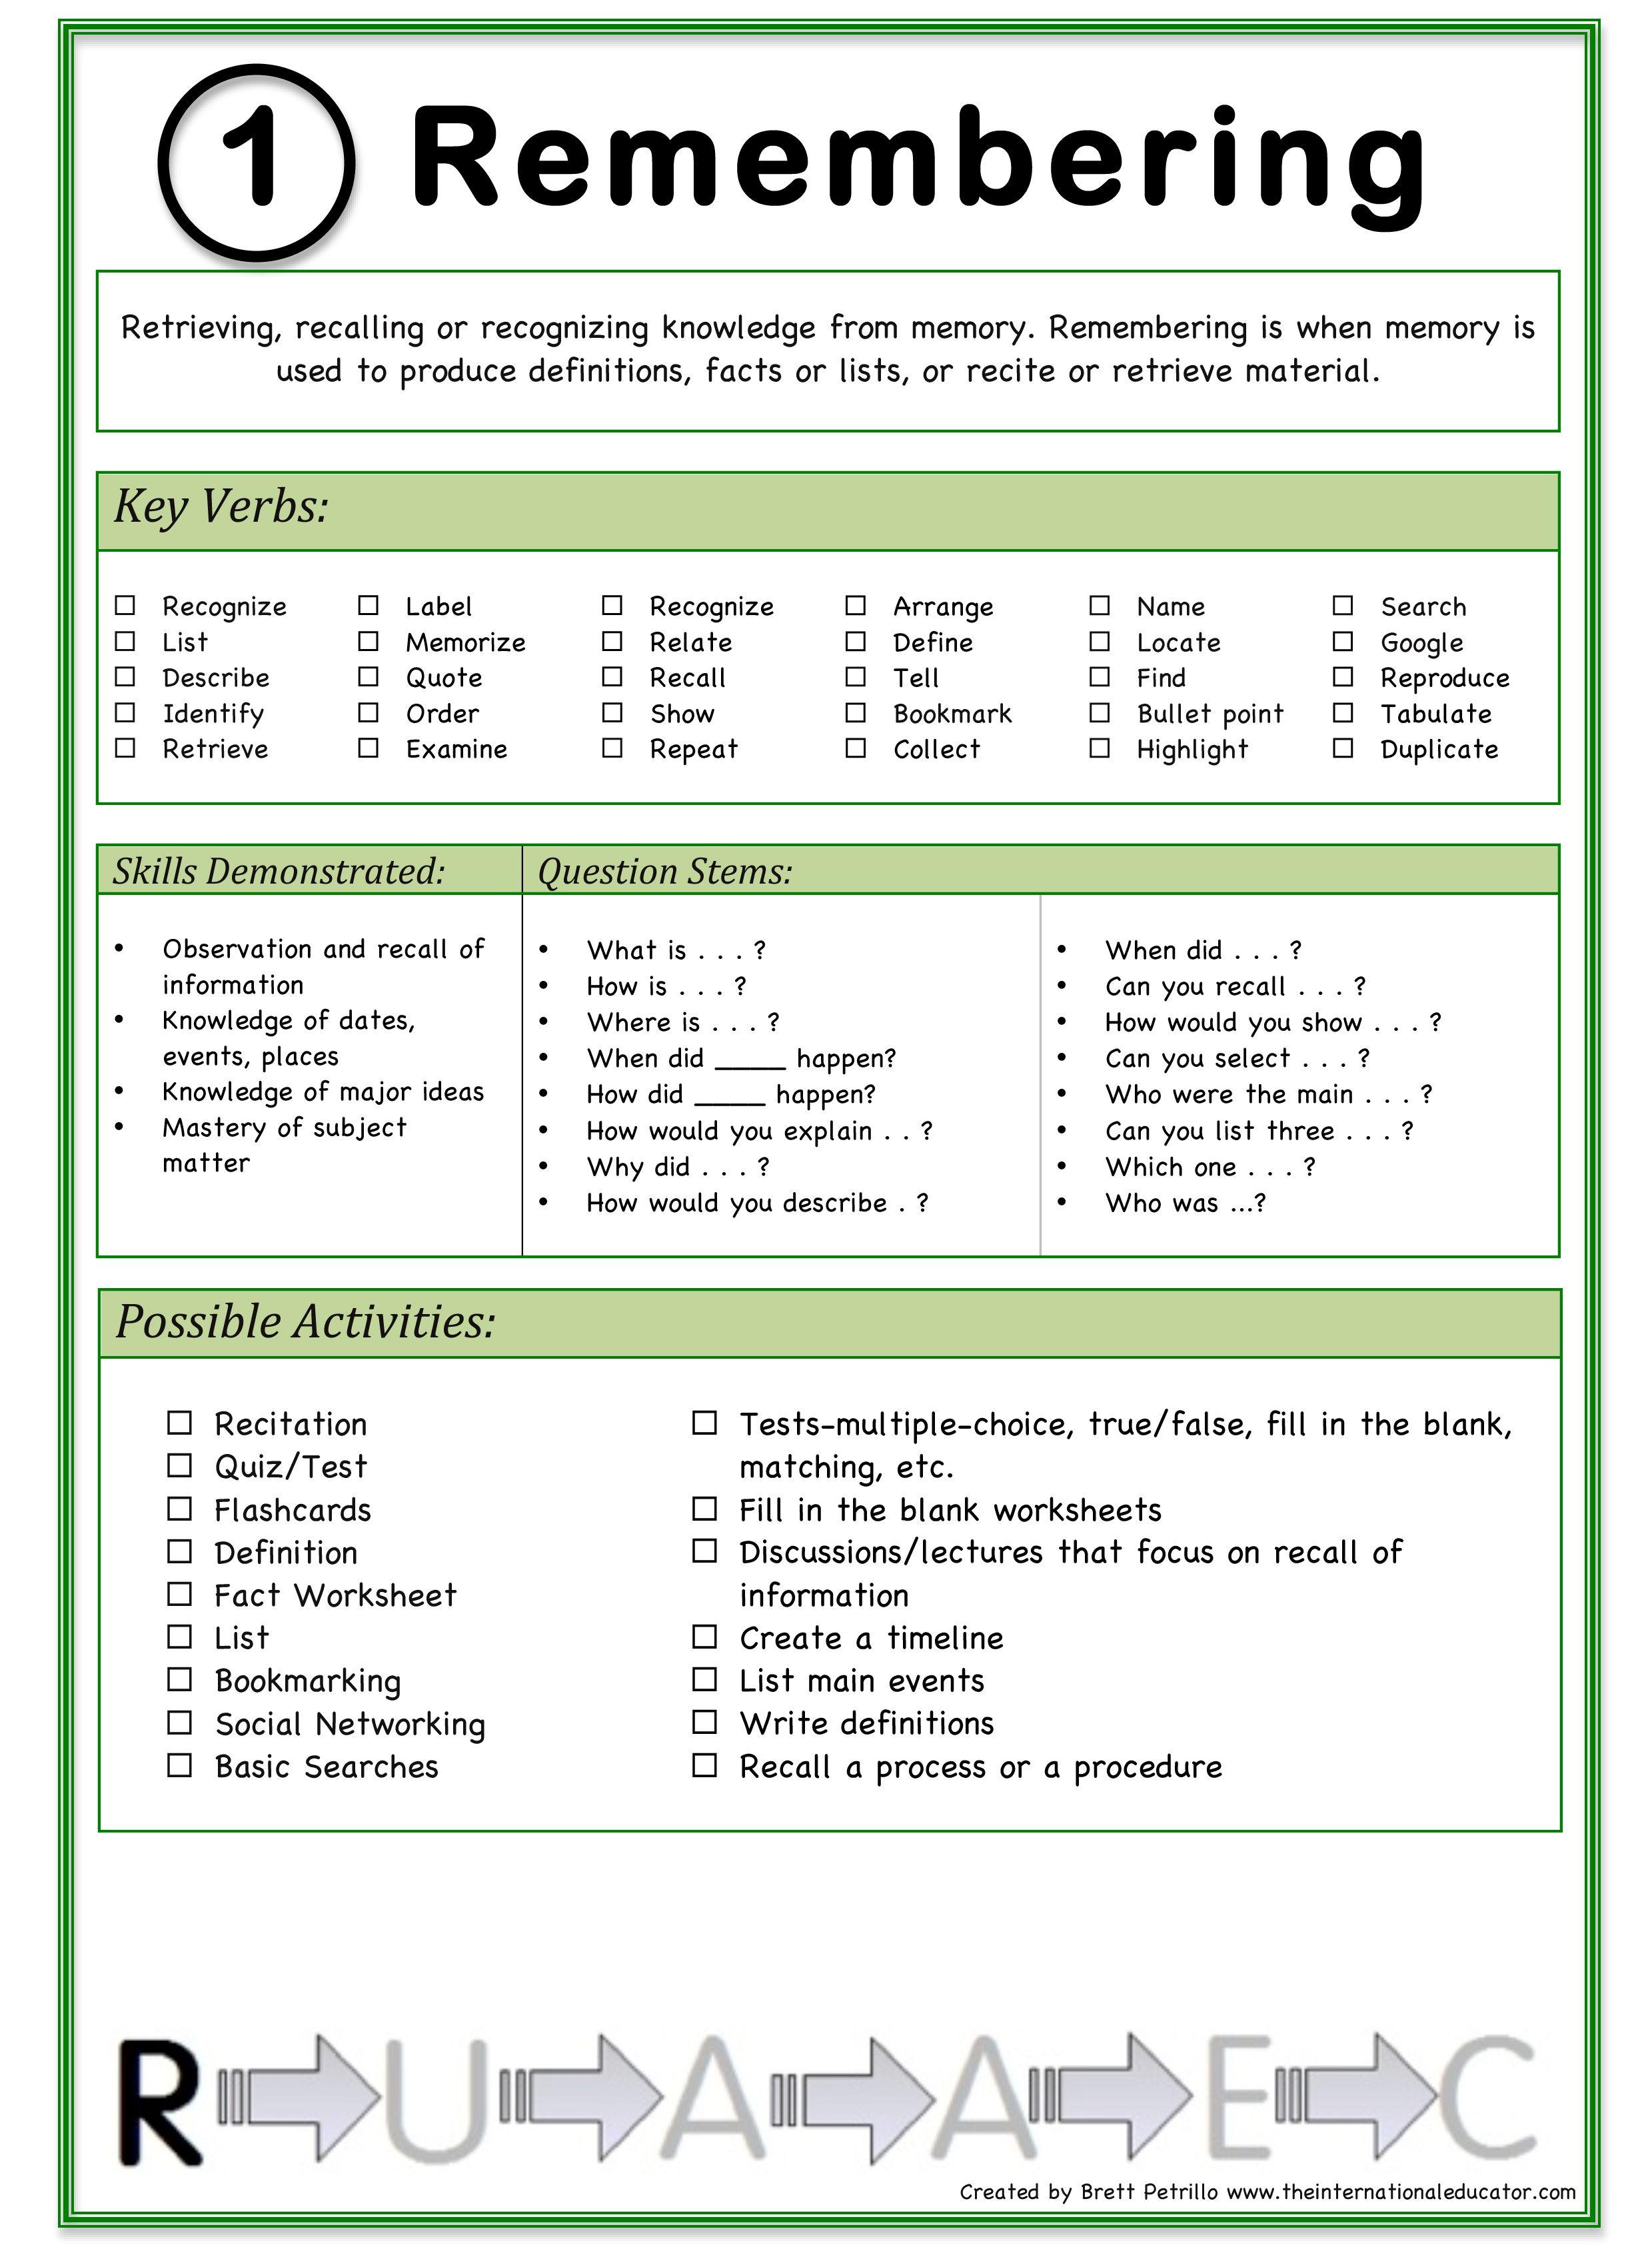 Help writing an exemplification essay